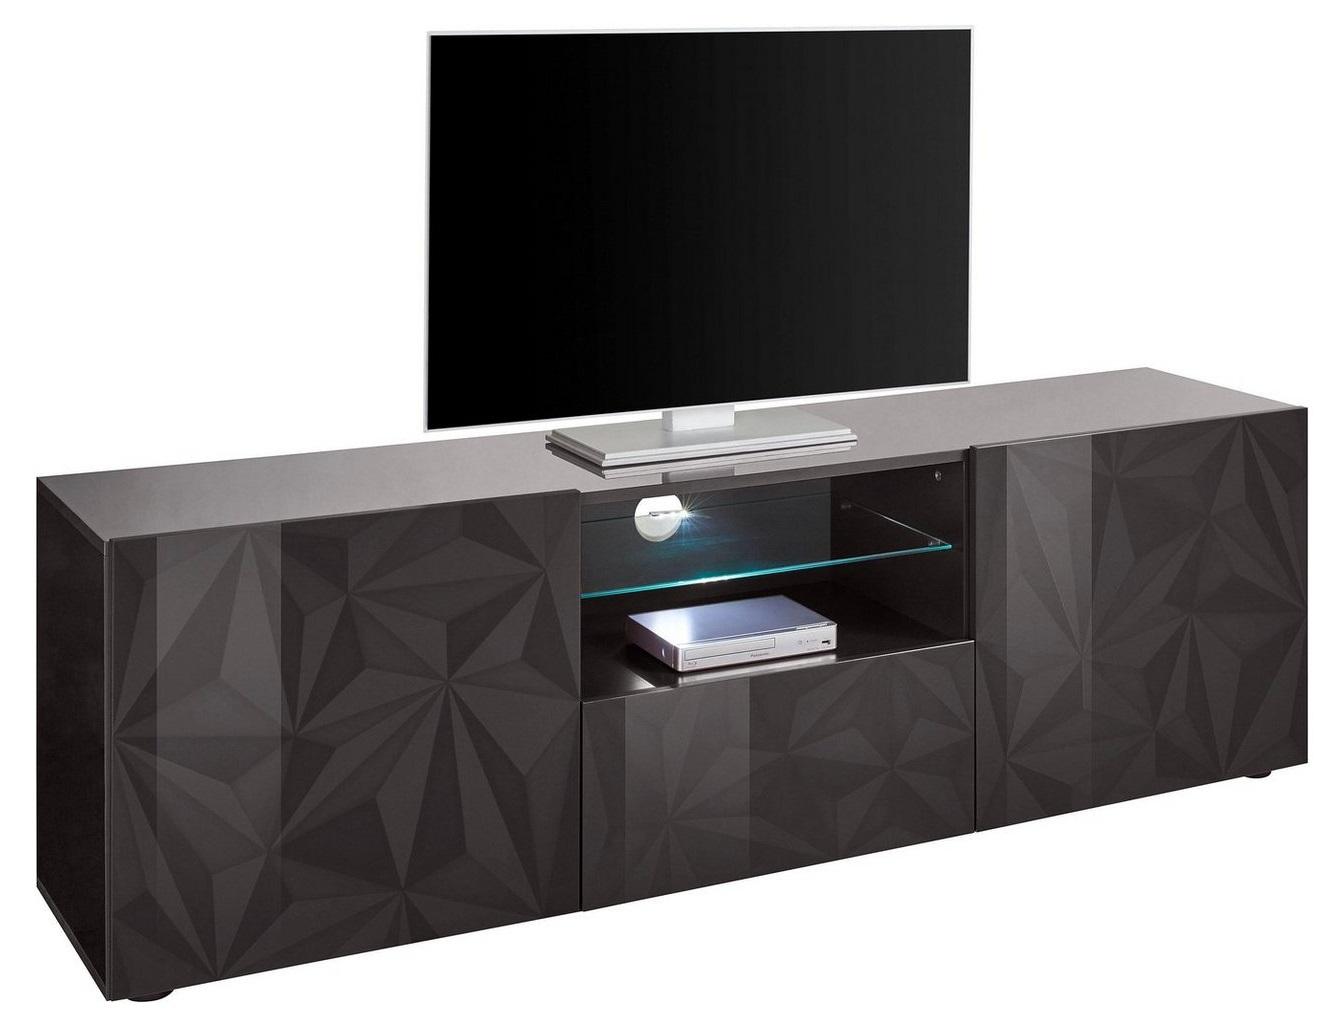 Tv-meubel Kristal 181 cm breed in hoogglans antraciet | Pesaro Mobilia